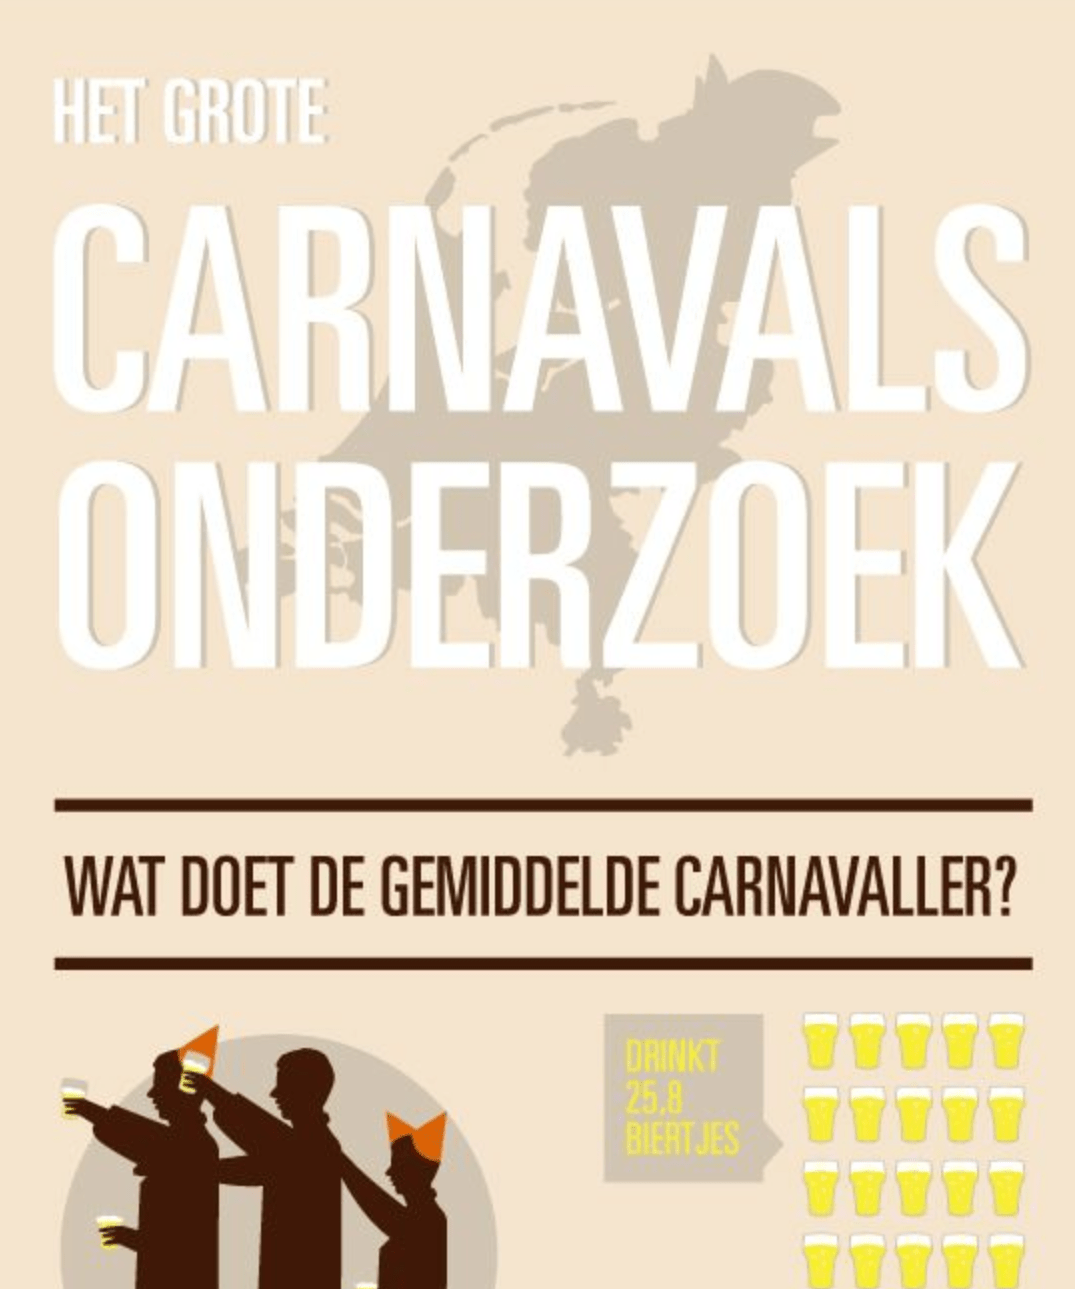 Carnavalsonderzoek